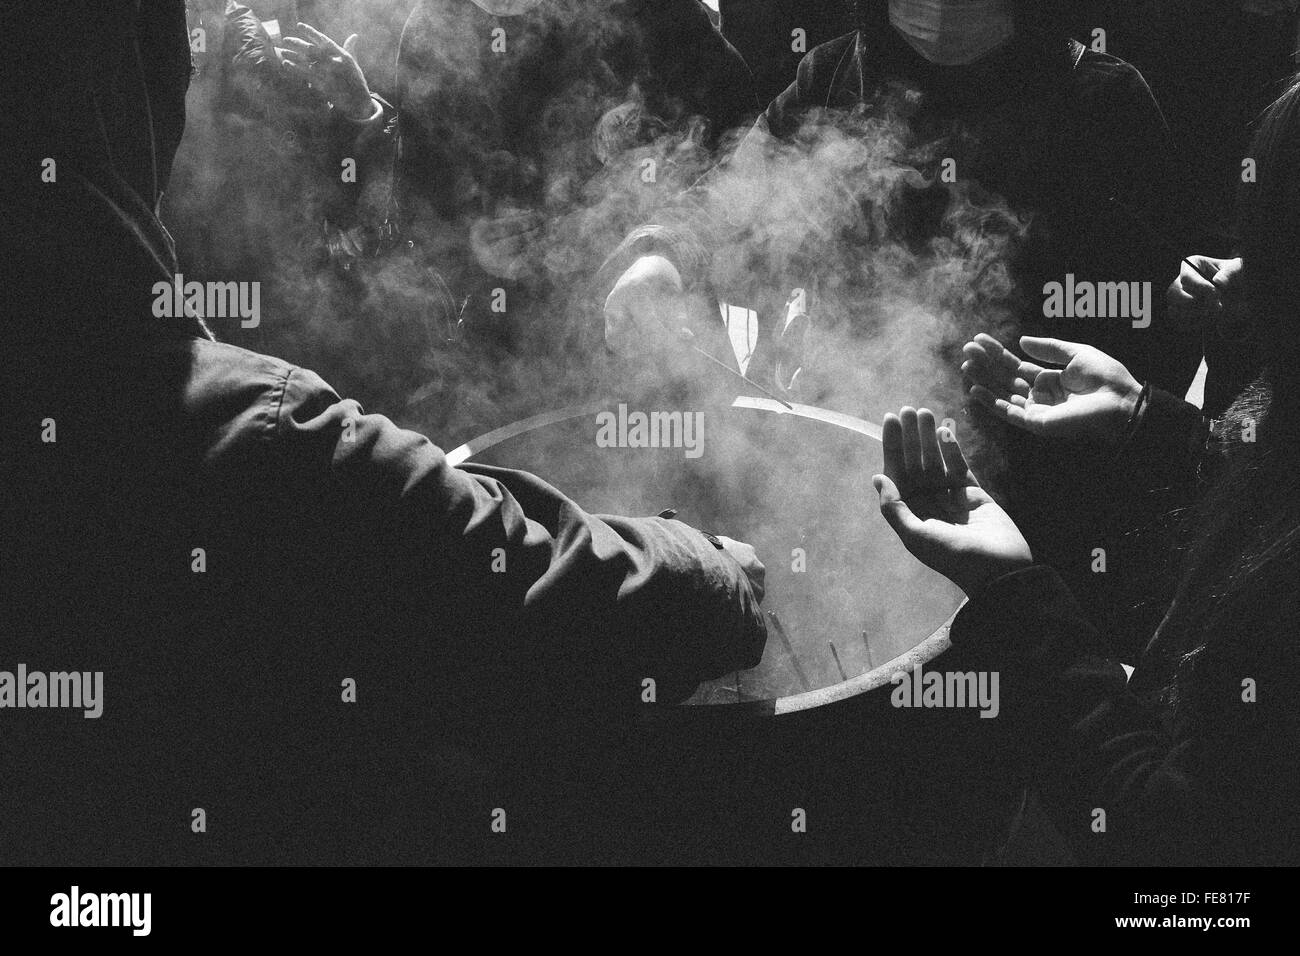 Group Of People Around Smoke Container - Stock Image